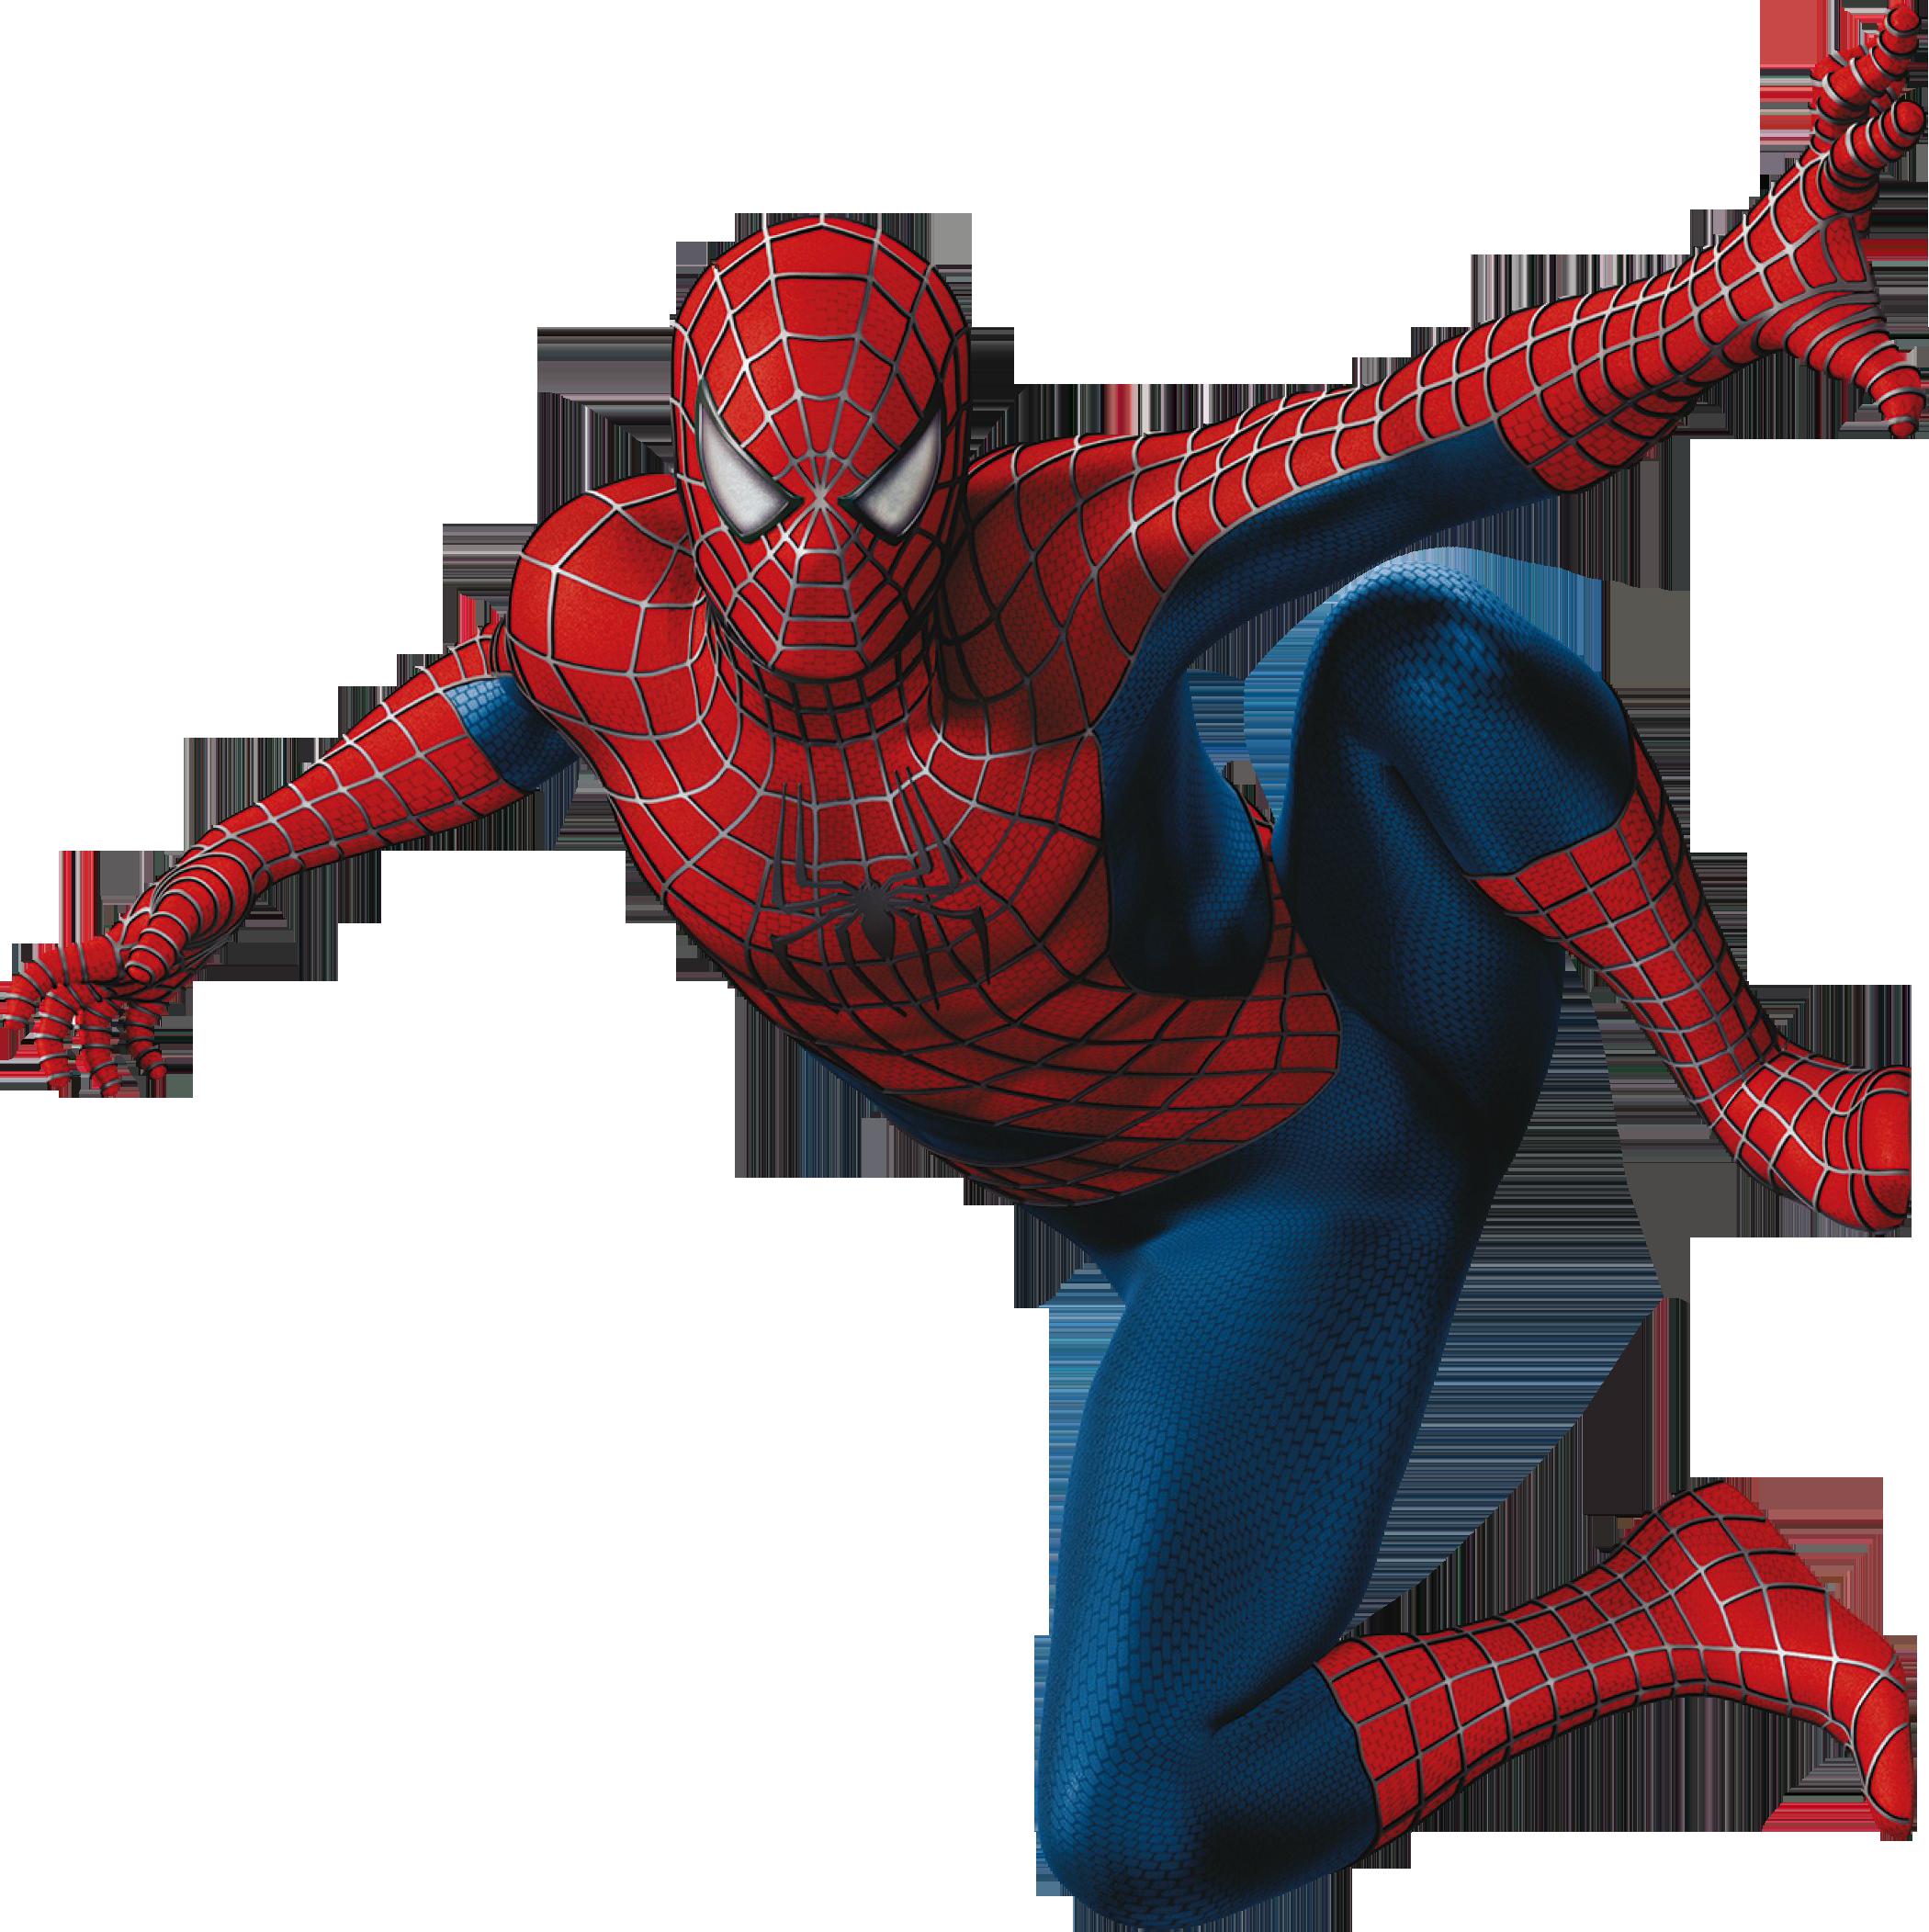 Spiderman youtube superhero.